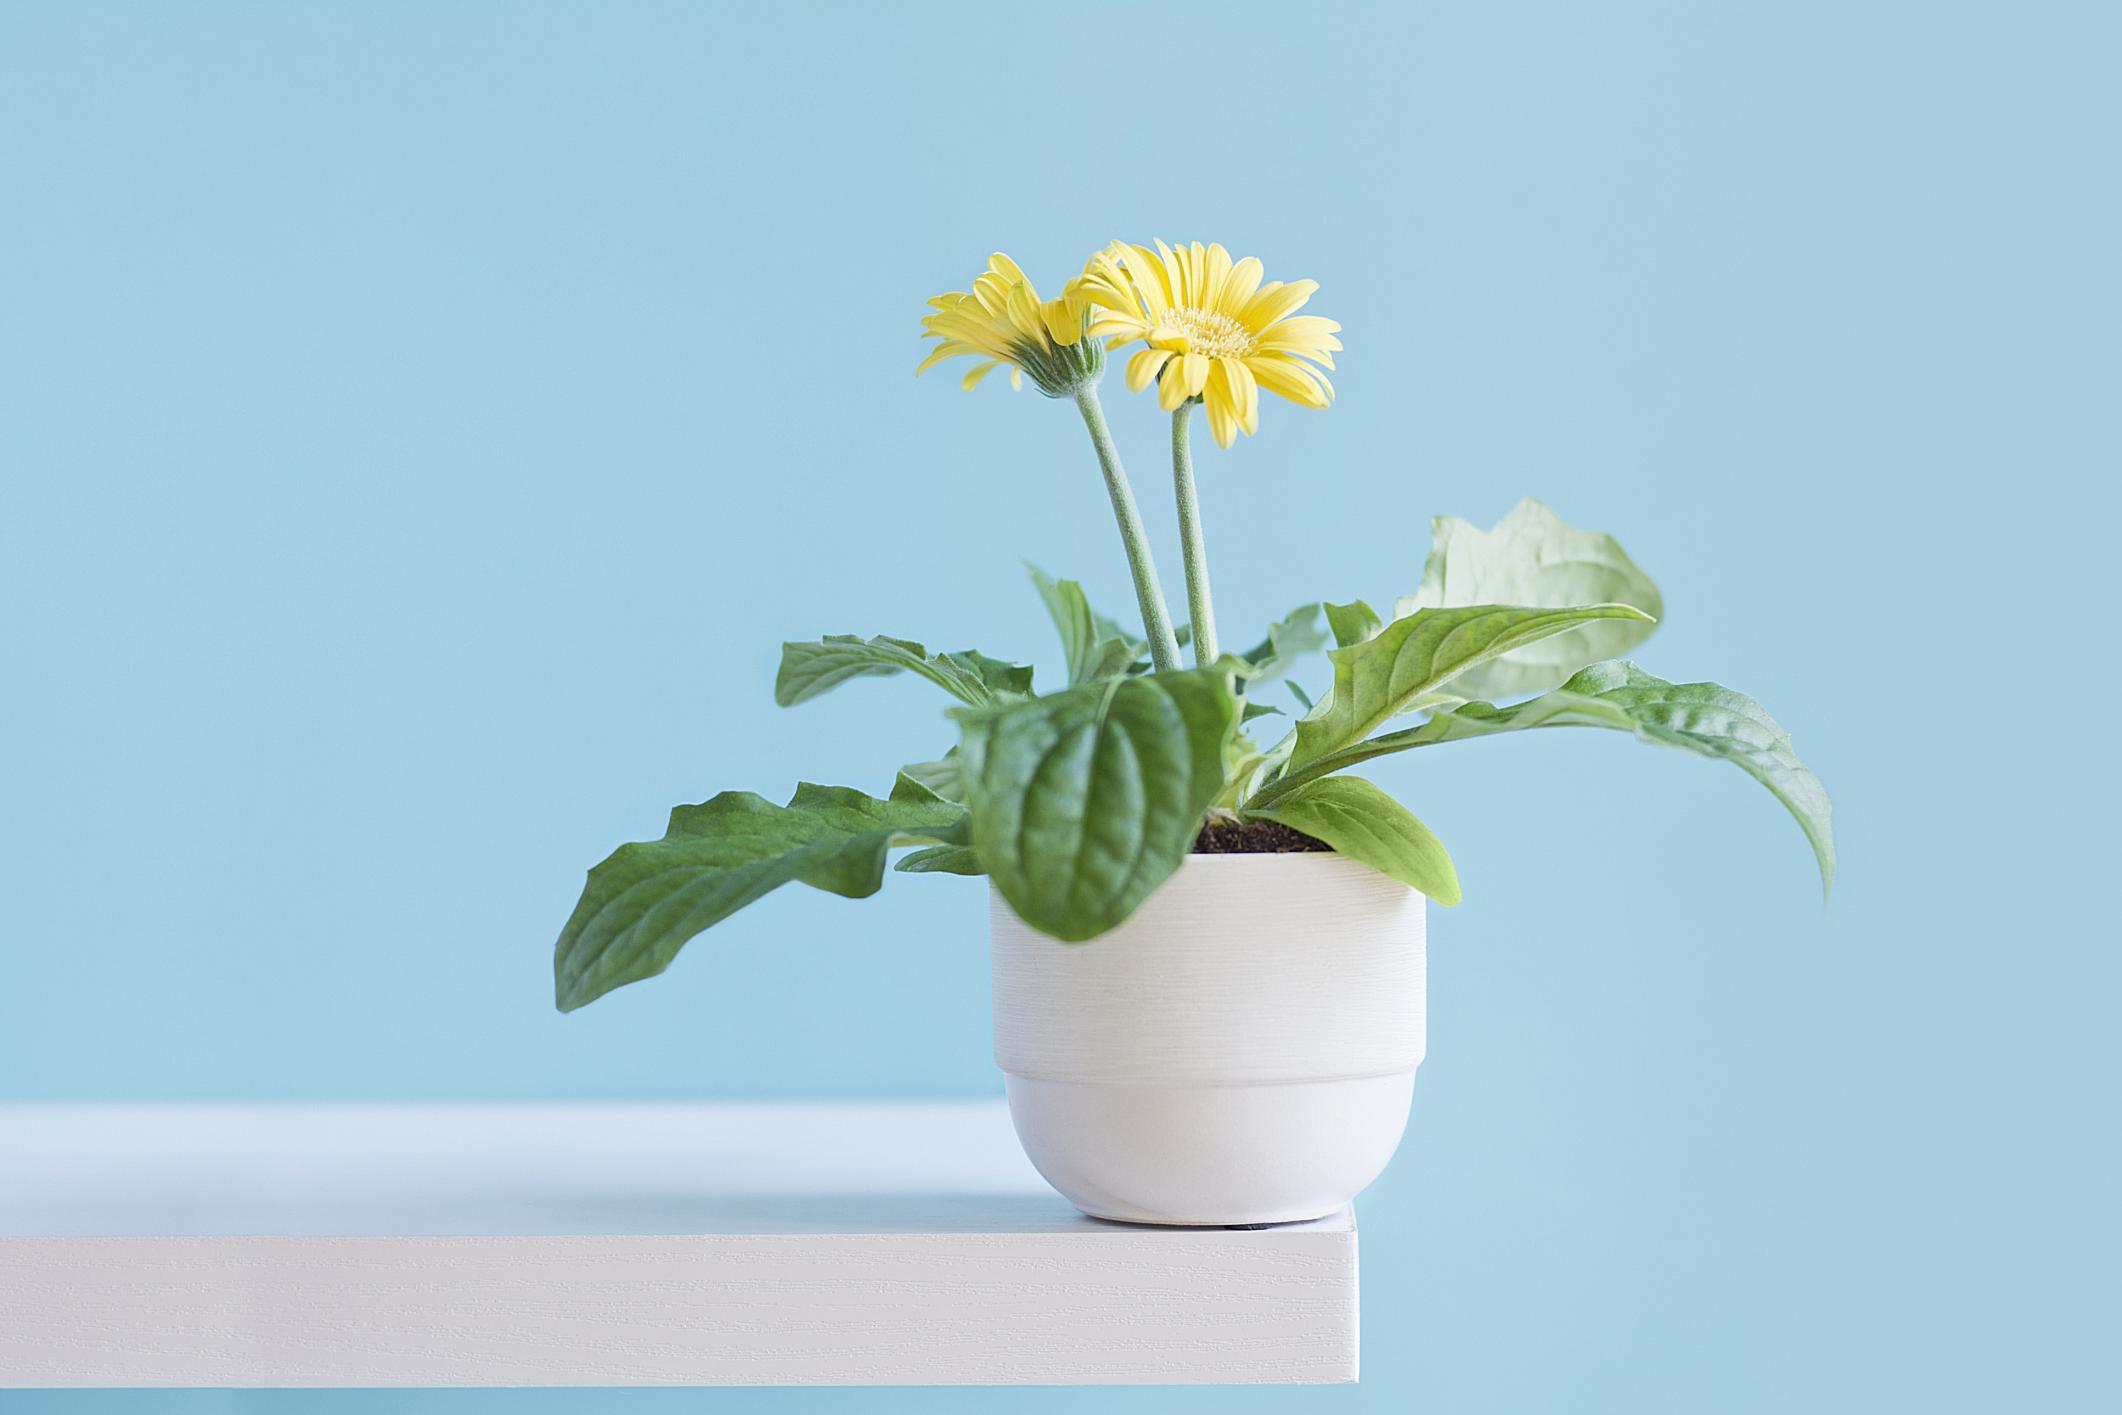 gi-plants-gerbera-daisy.jpg